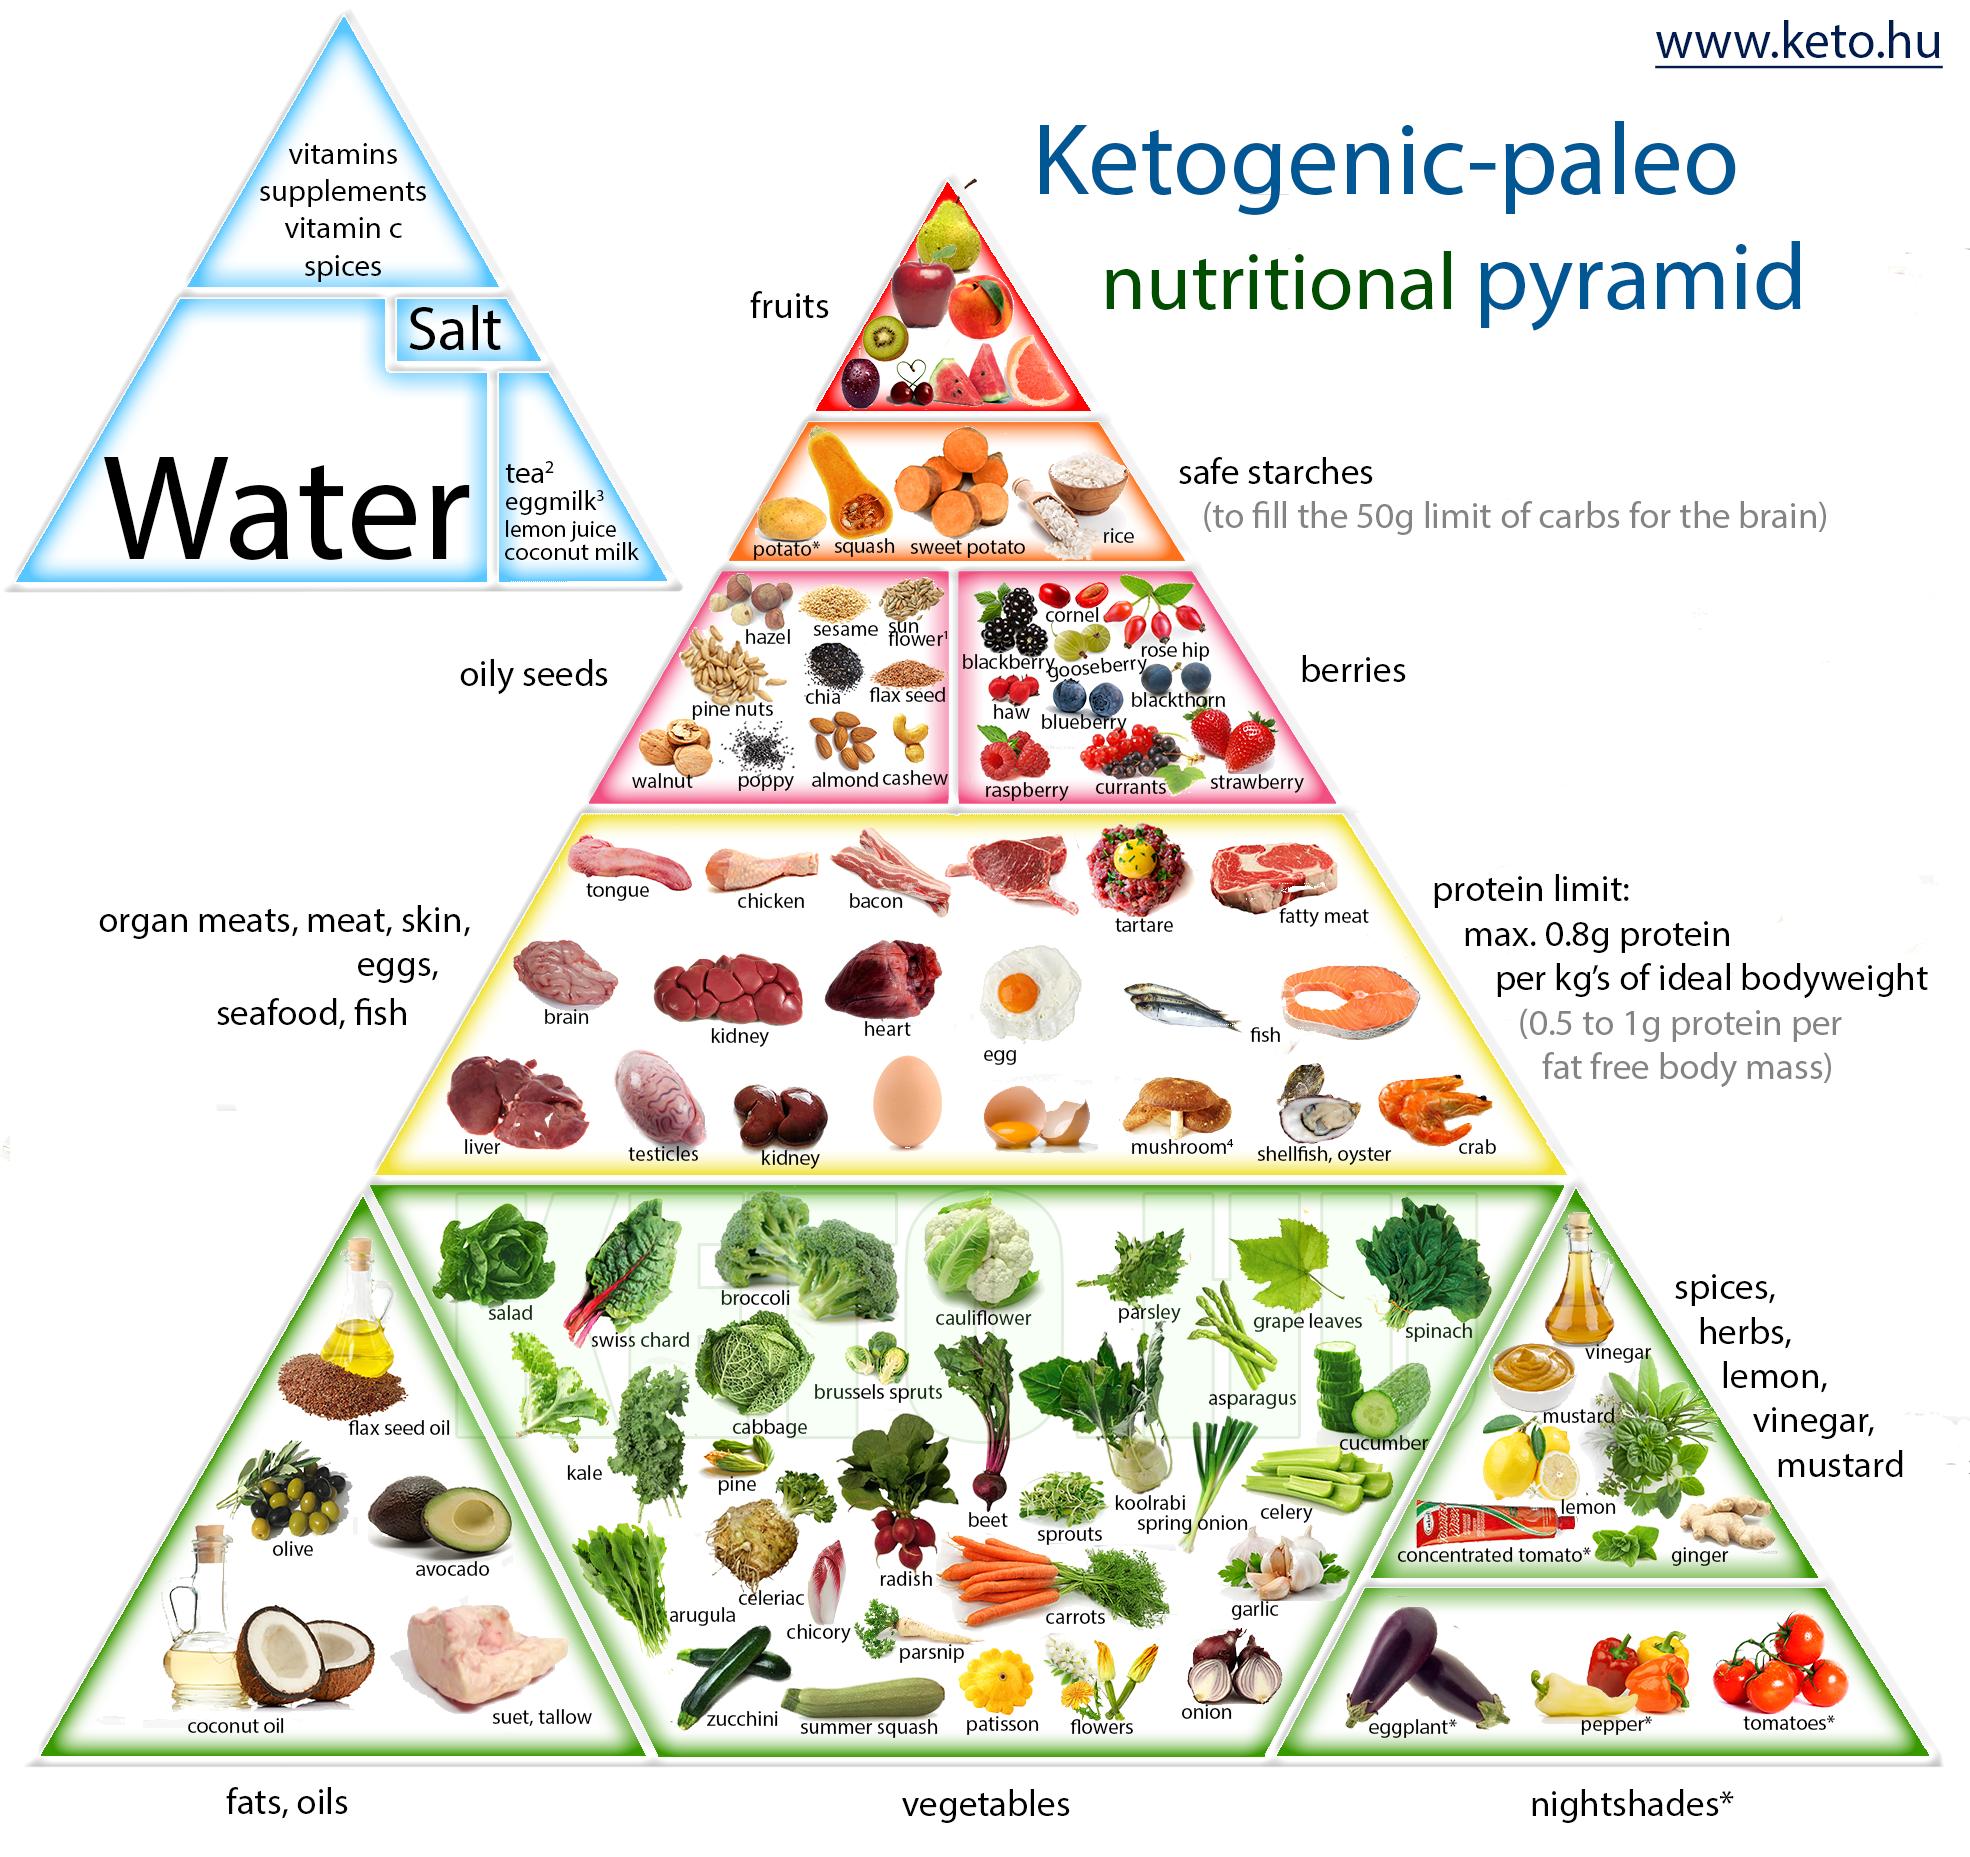 Ketogenic Paleo Nutrition Pyramid Ketogen Paleo Receptek Keto Food Pyramid Paleo Nutrition Food Pyramid